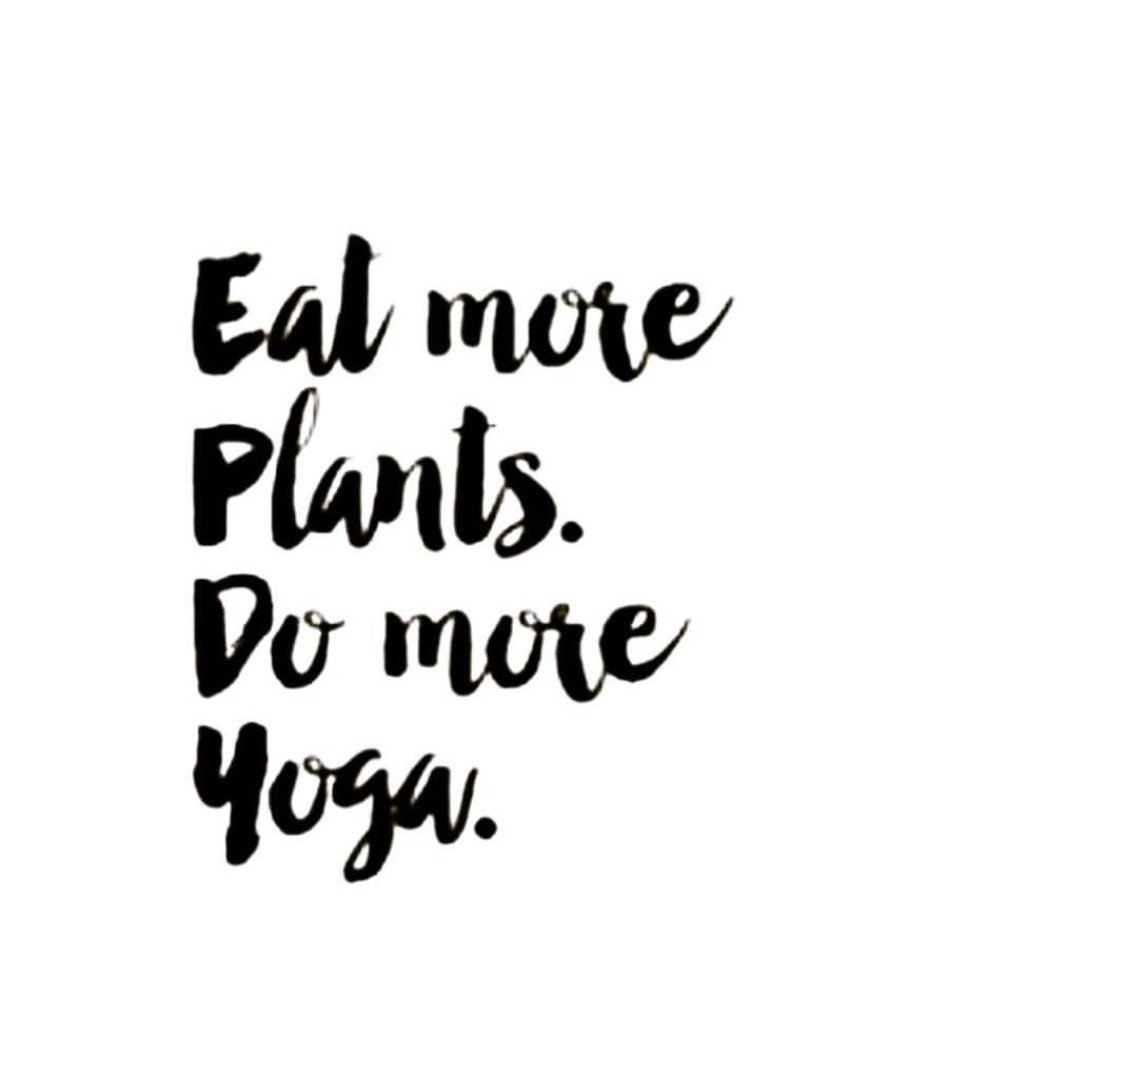 YEAH! #vegan #yoga https://t.co/4QeUplehYA